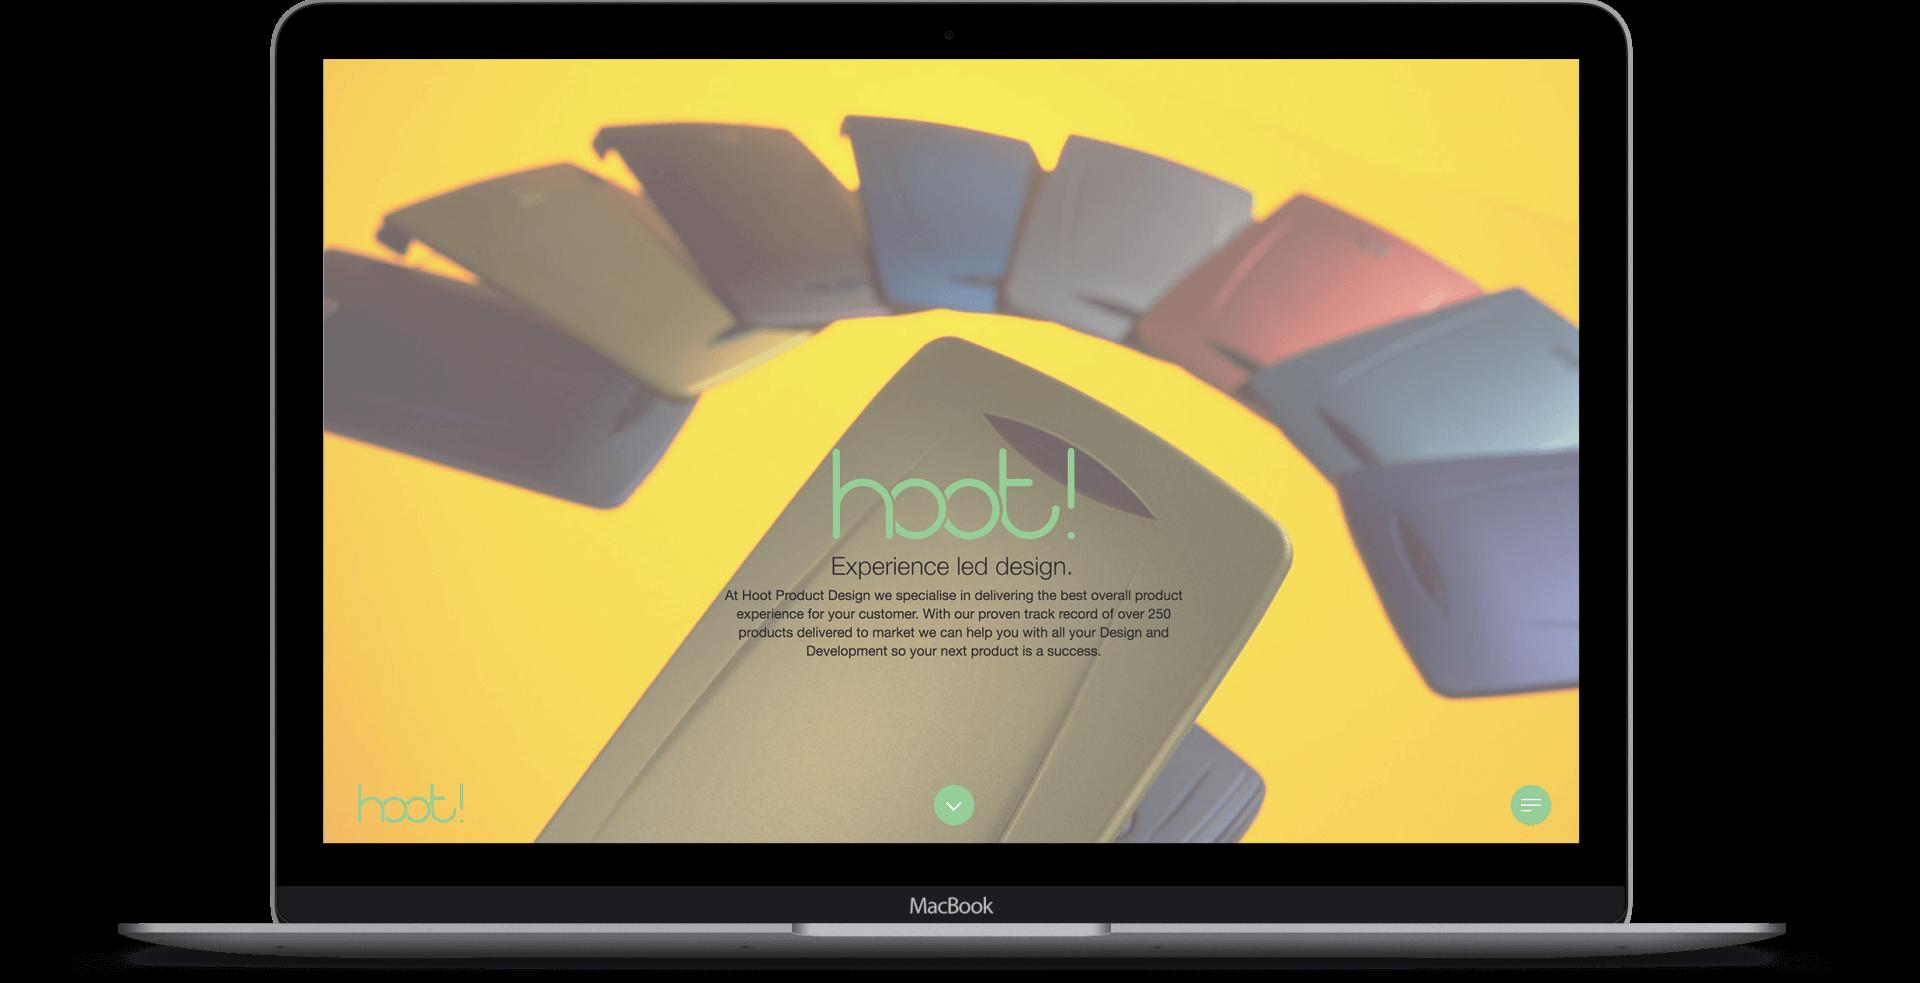 Hoot Product Design  - Website Re-design